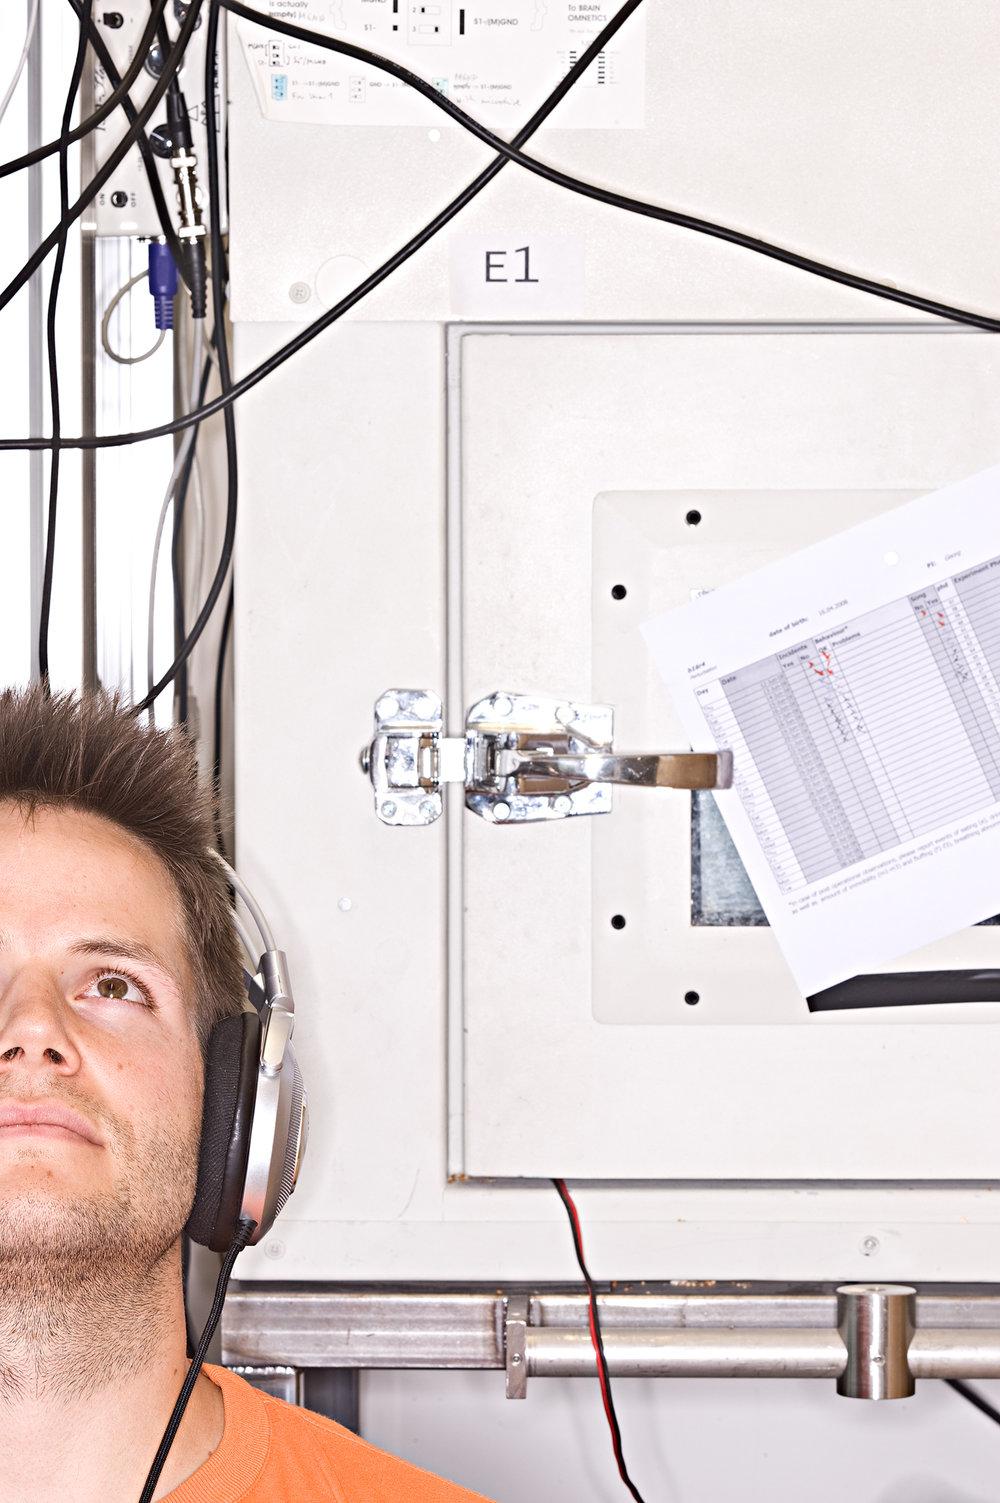 Brain Research, ETH Zürich, Corporate Fotografie, Geschäftsbericht, Firmenfotografie, Porträtfotografie, Zürich, Schweiz